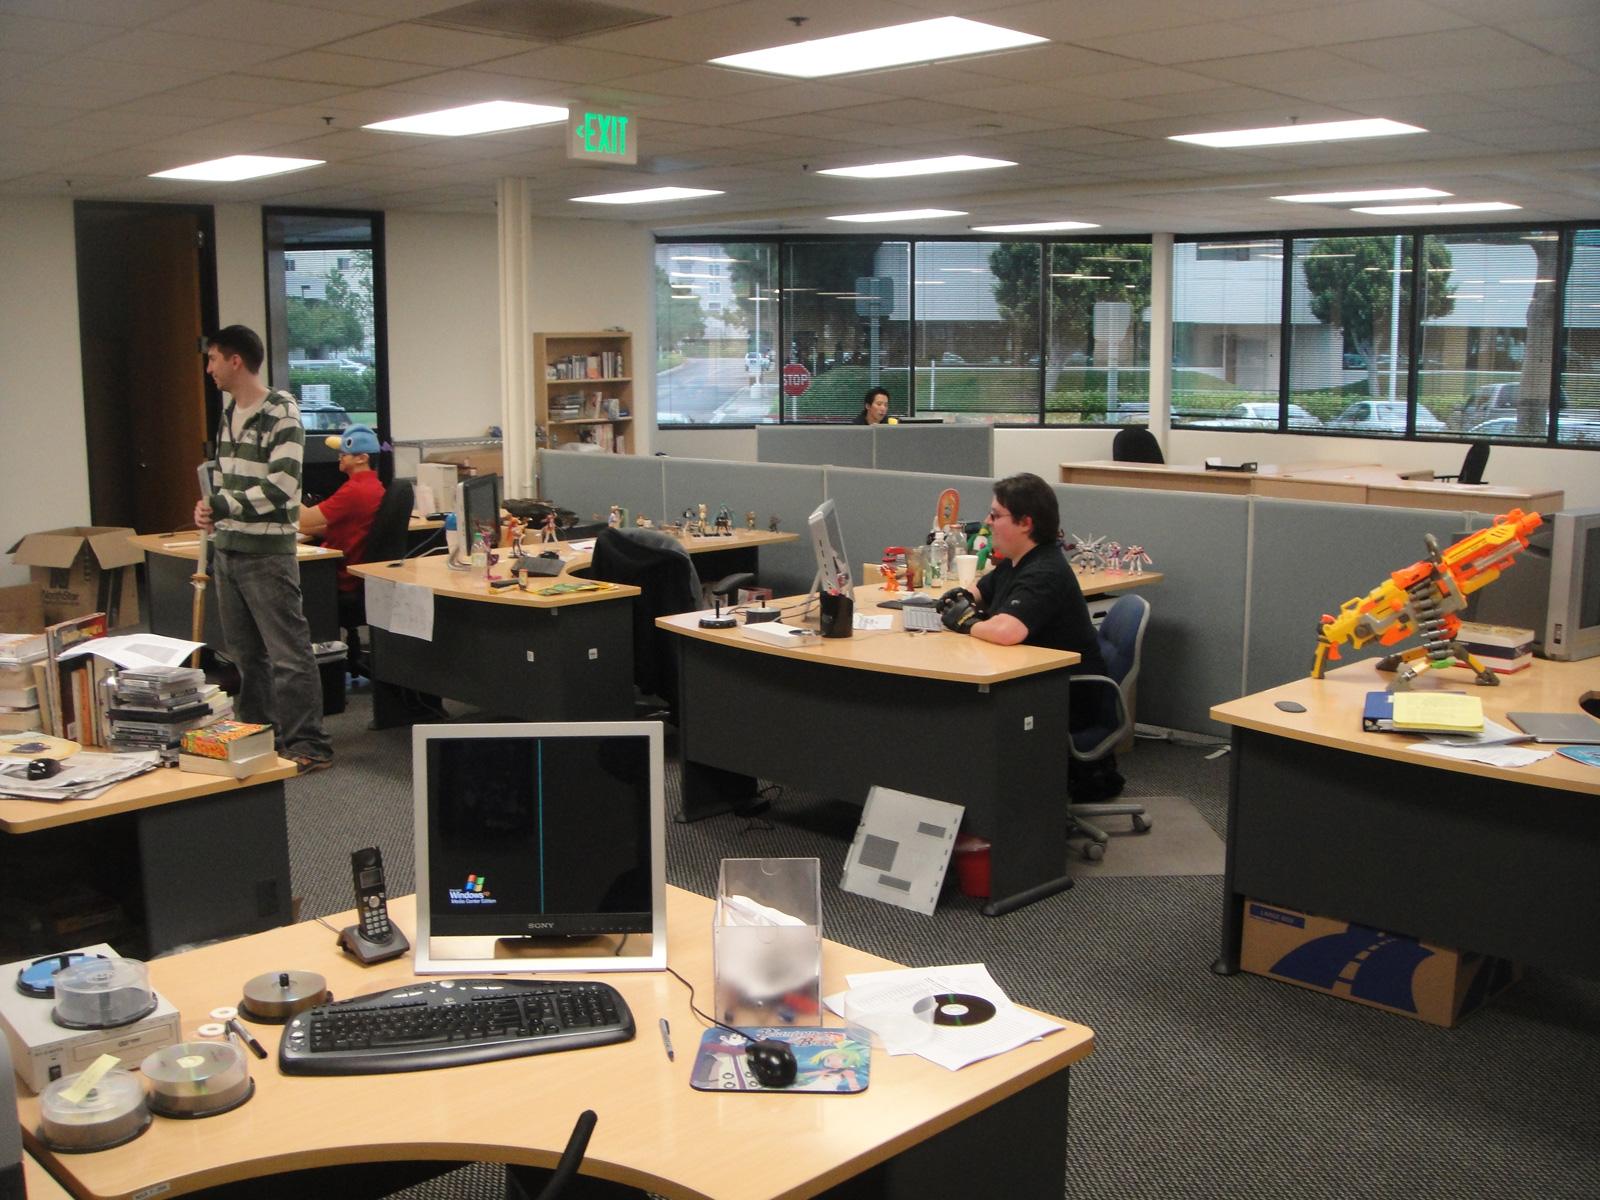 las oficinas de nisa pintas inside meristation